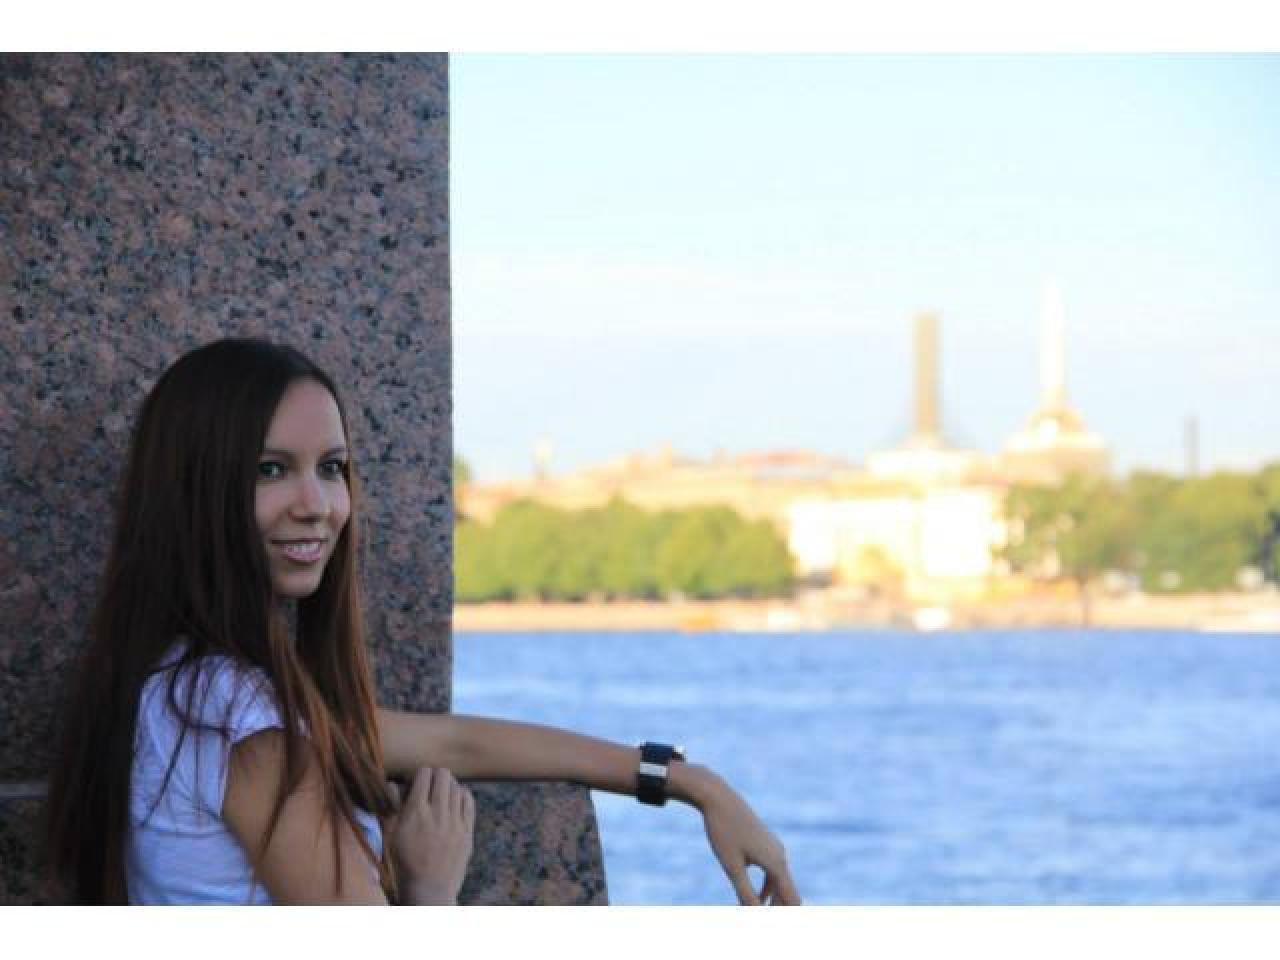 Russian language tutor (native speaker) by Skype - 1